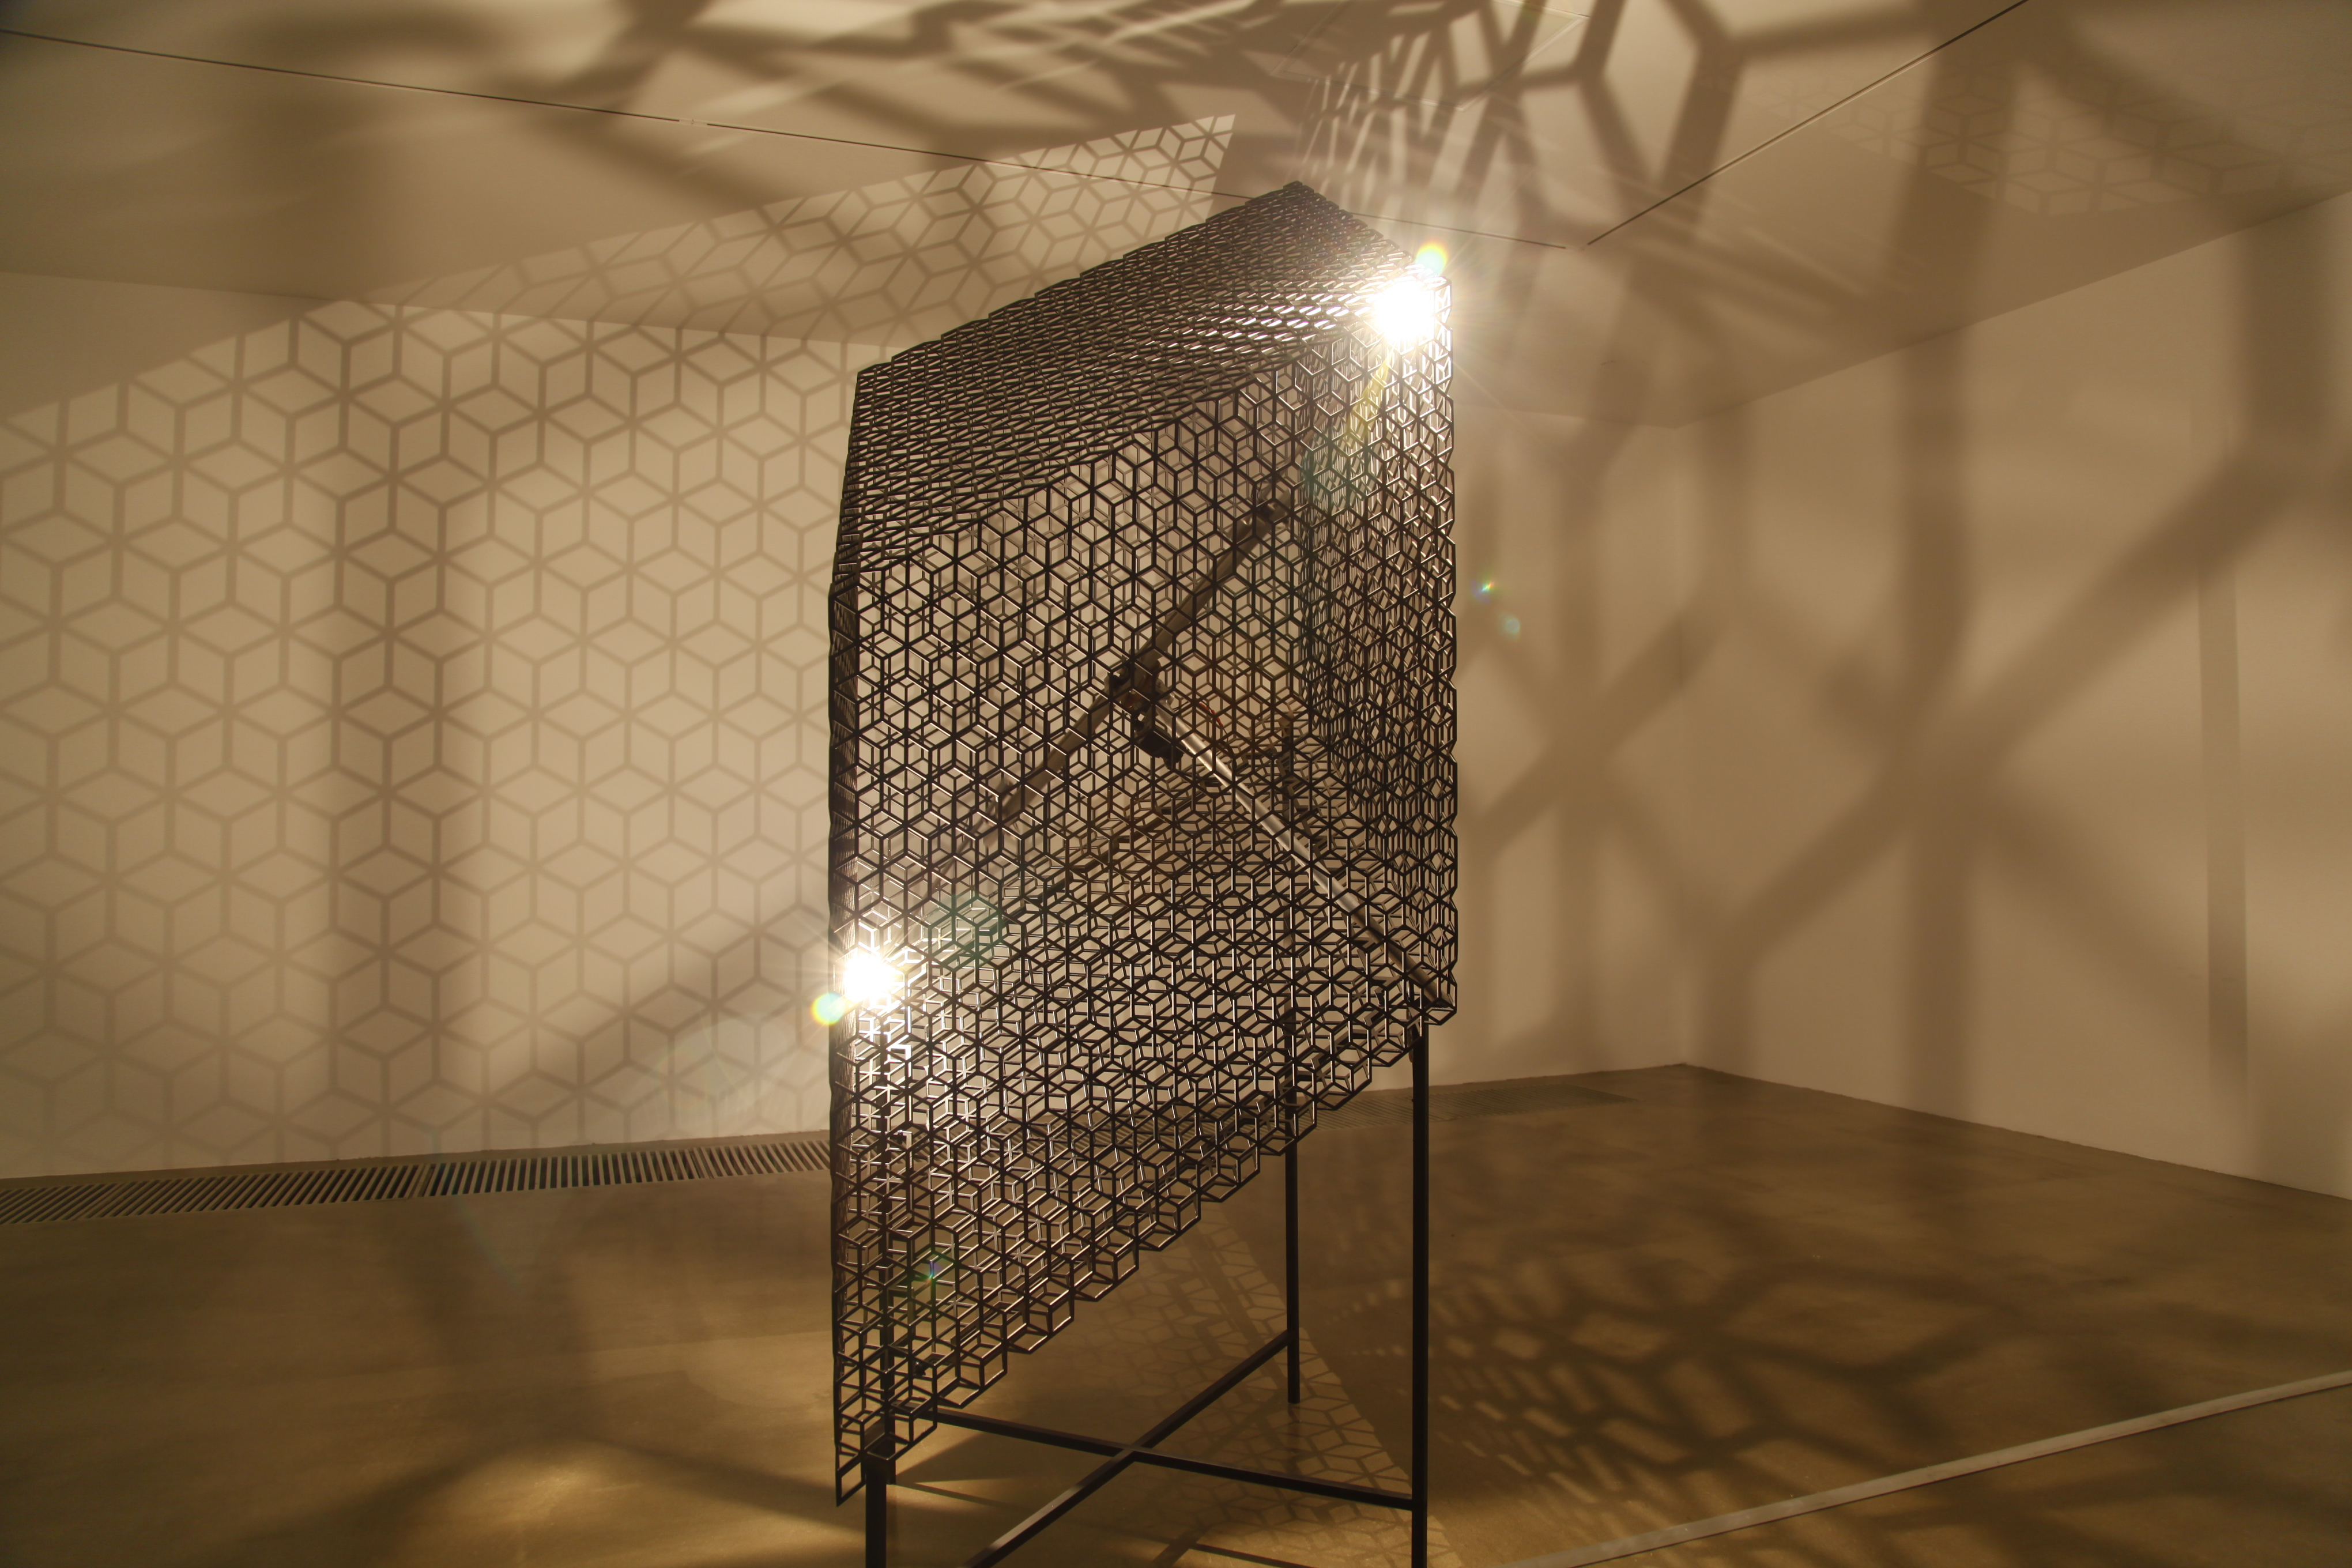 Slow Arc in a Cube VIII_Powder coated steel, aluminium, halogen lights, mechanical system_140 x 95 x 270_2014